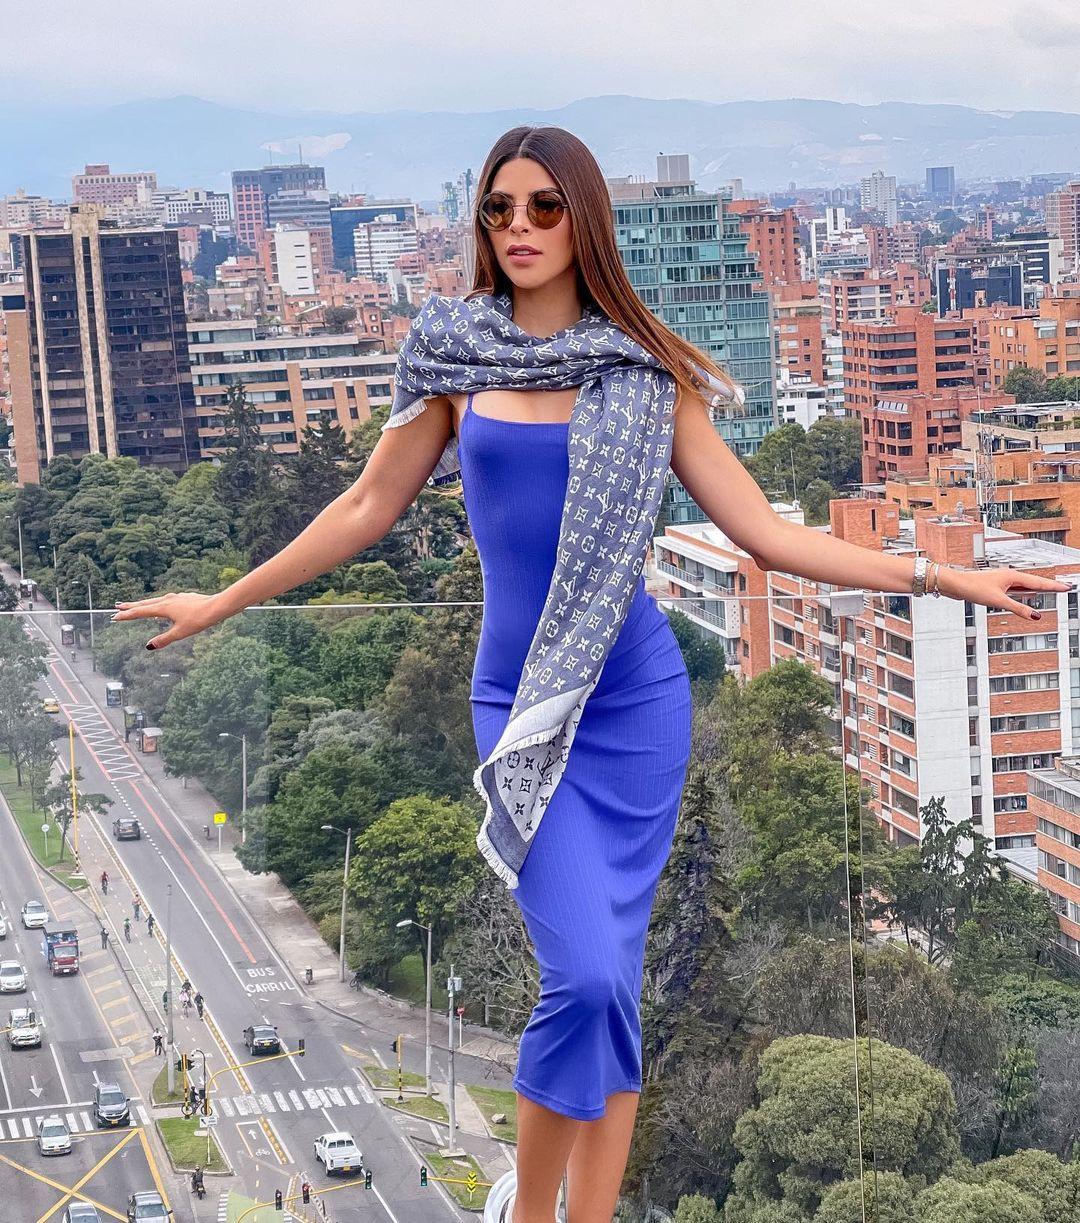 laura olascuaga, miss colombia universo 2020. - Página 12 Qviy2n10